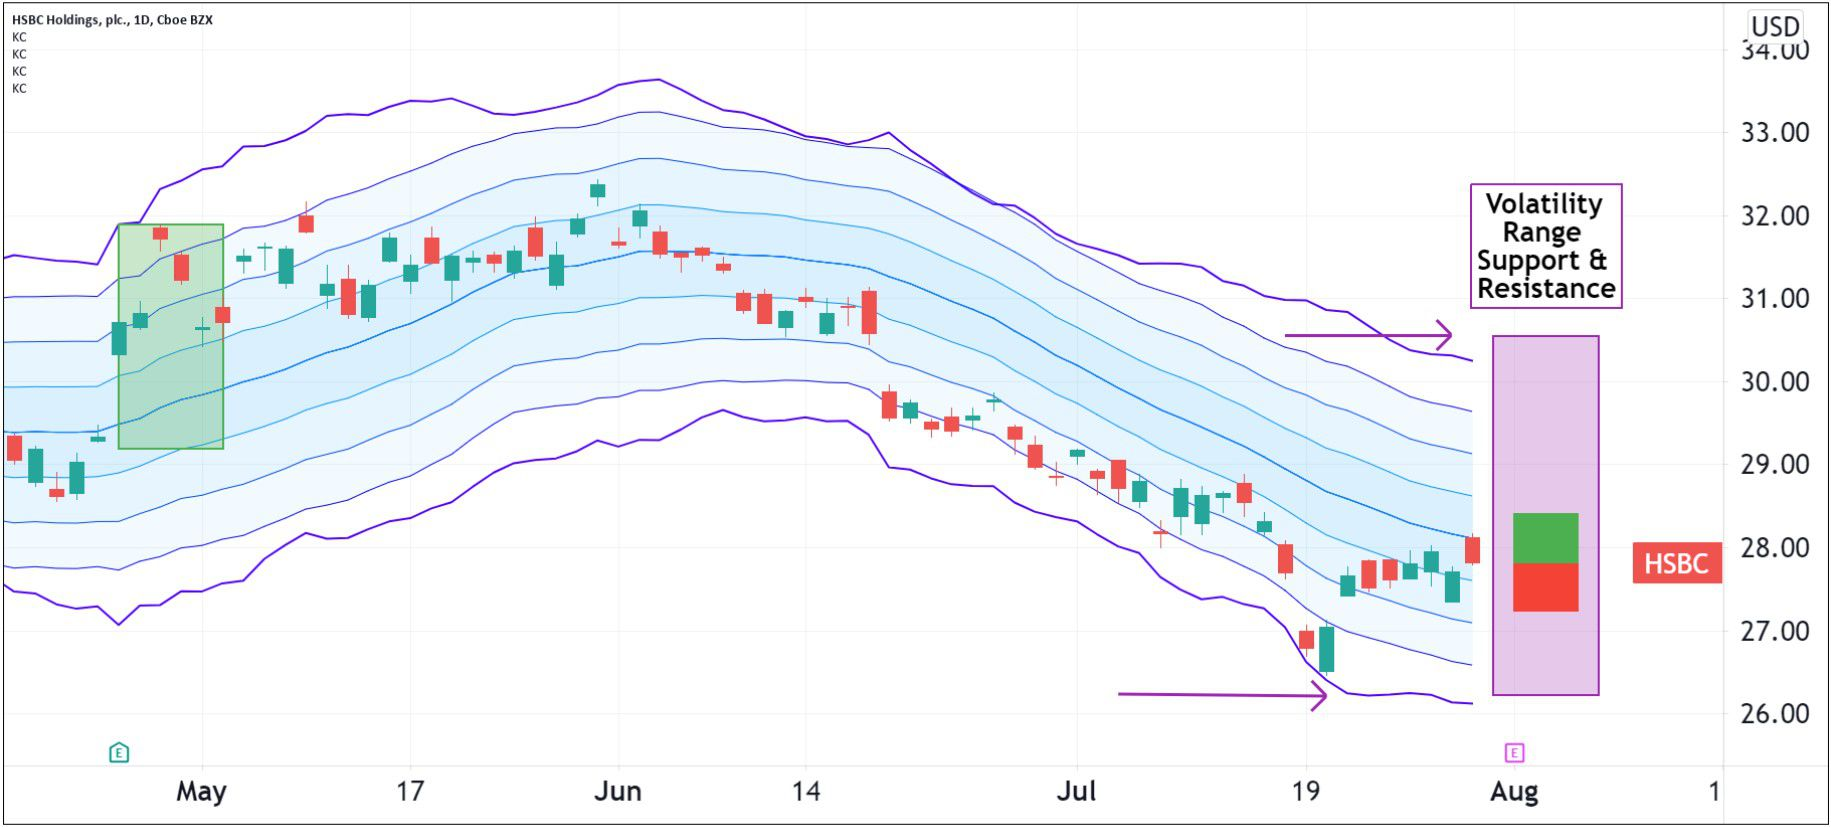 Volatility pattern for HSBC Holdings (HSBC)